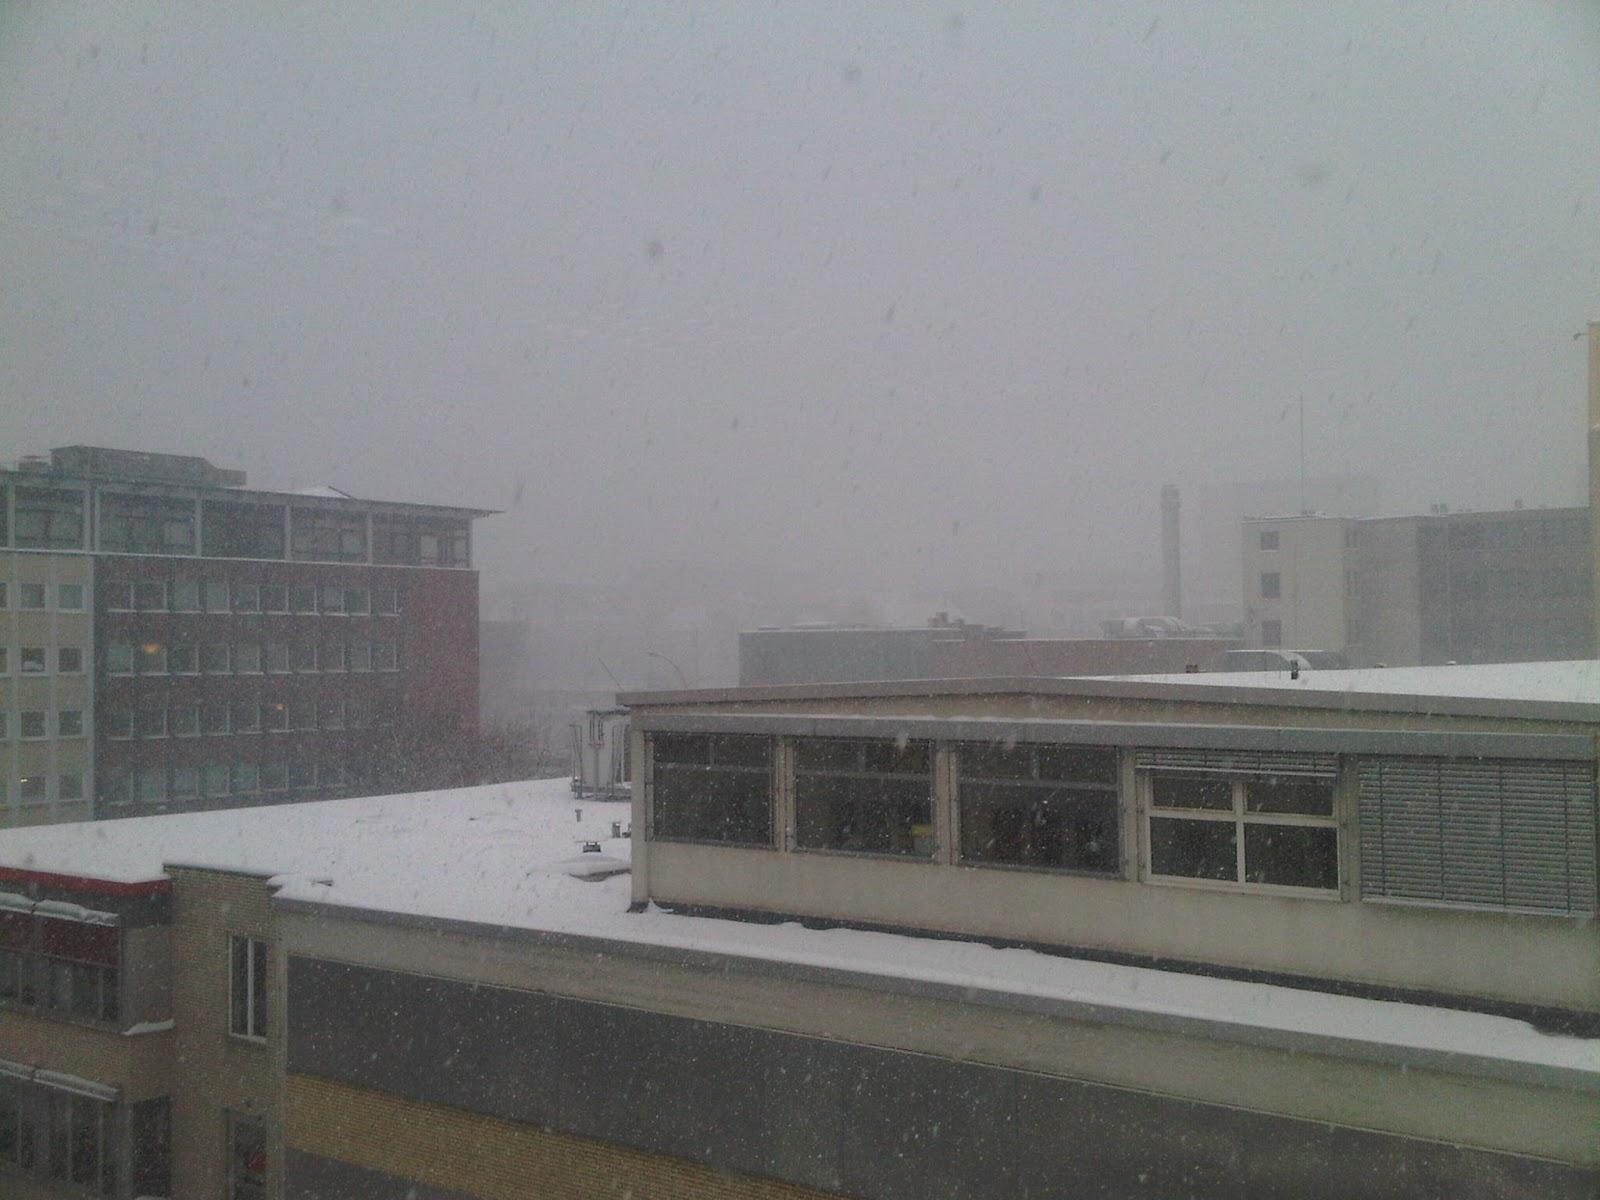 Hammerbrook bei Schneetreiben